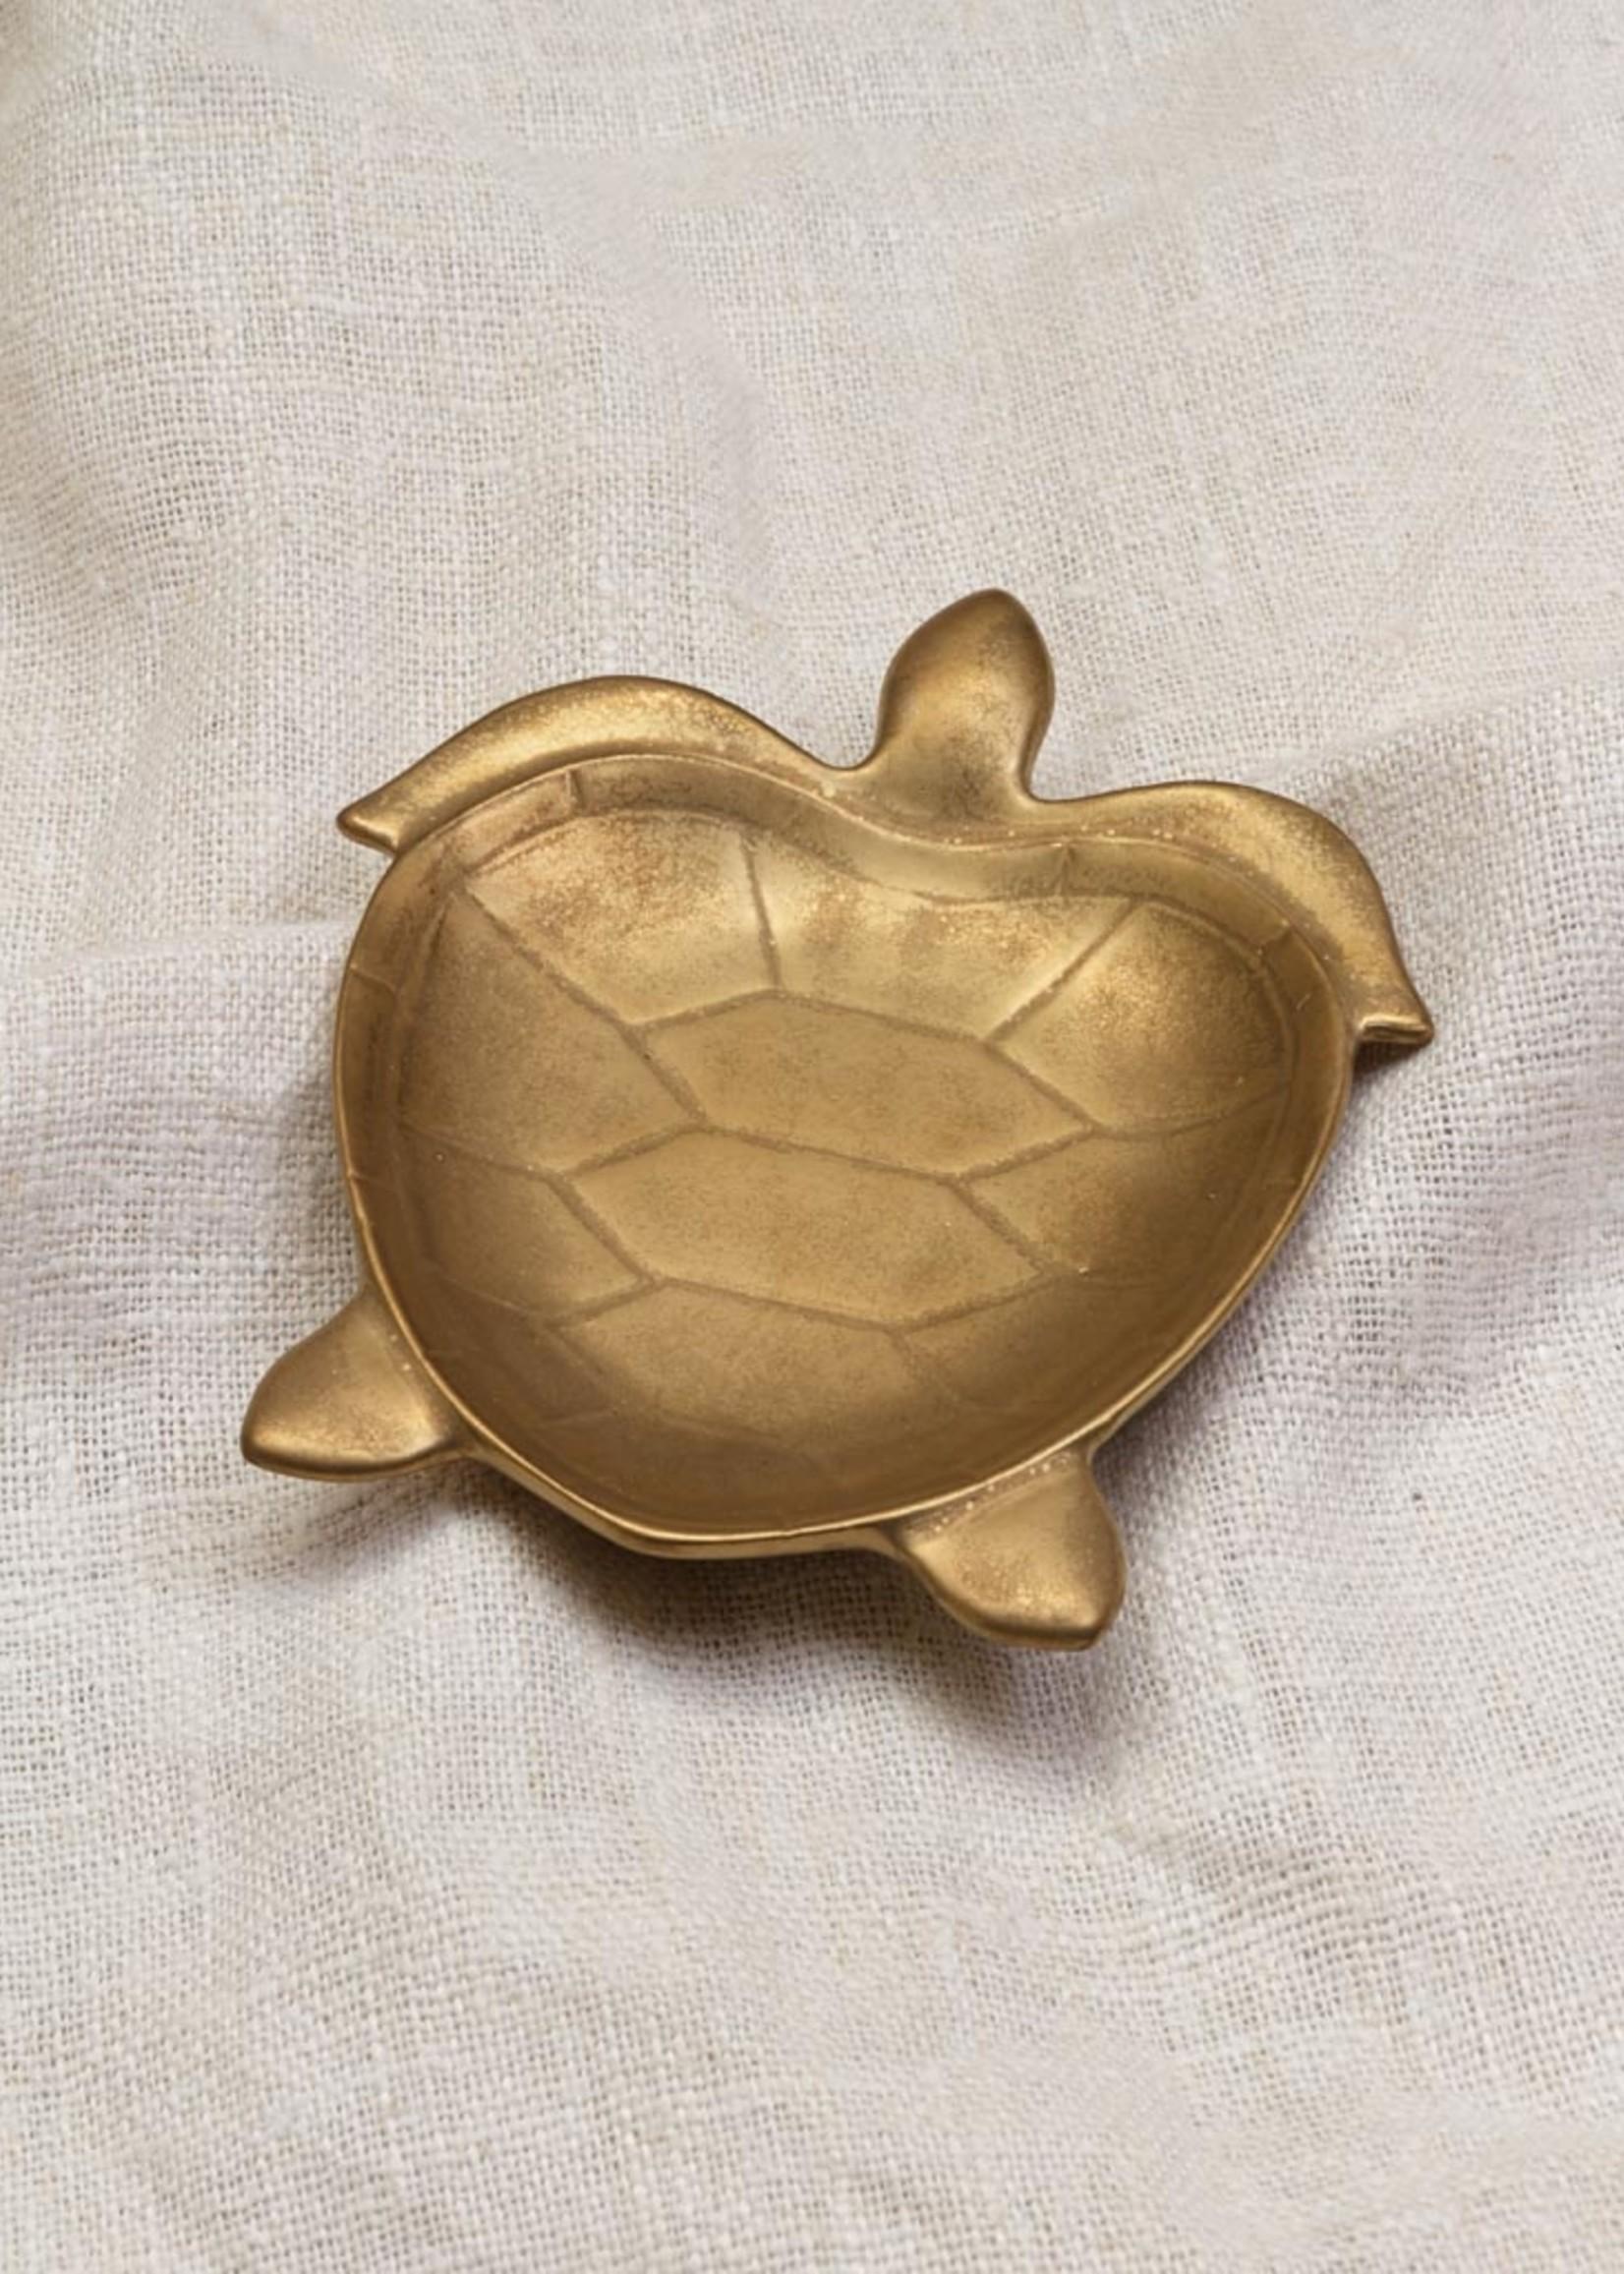 Chehoma Schaaltje SCHILDPAD goud Small 18 x 15cm